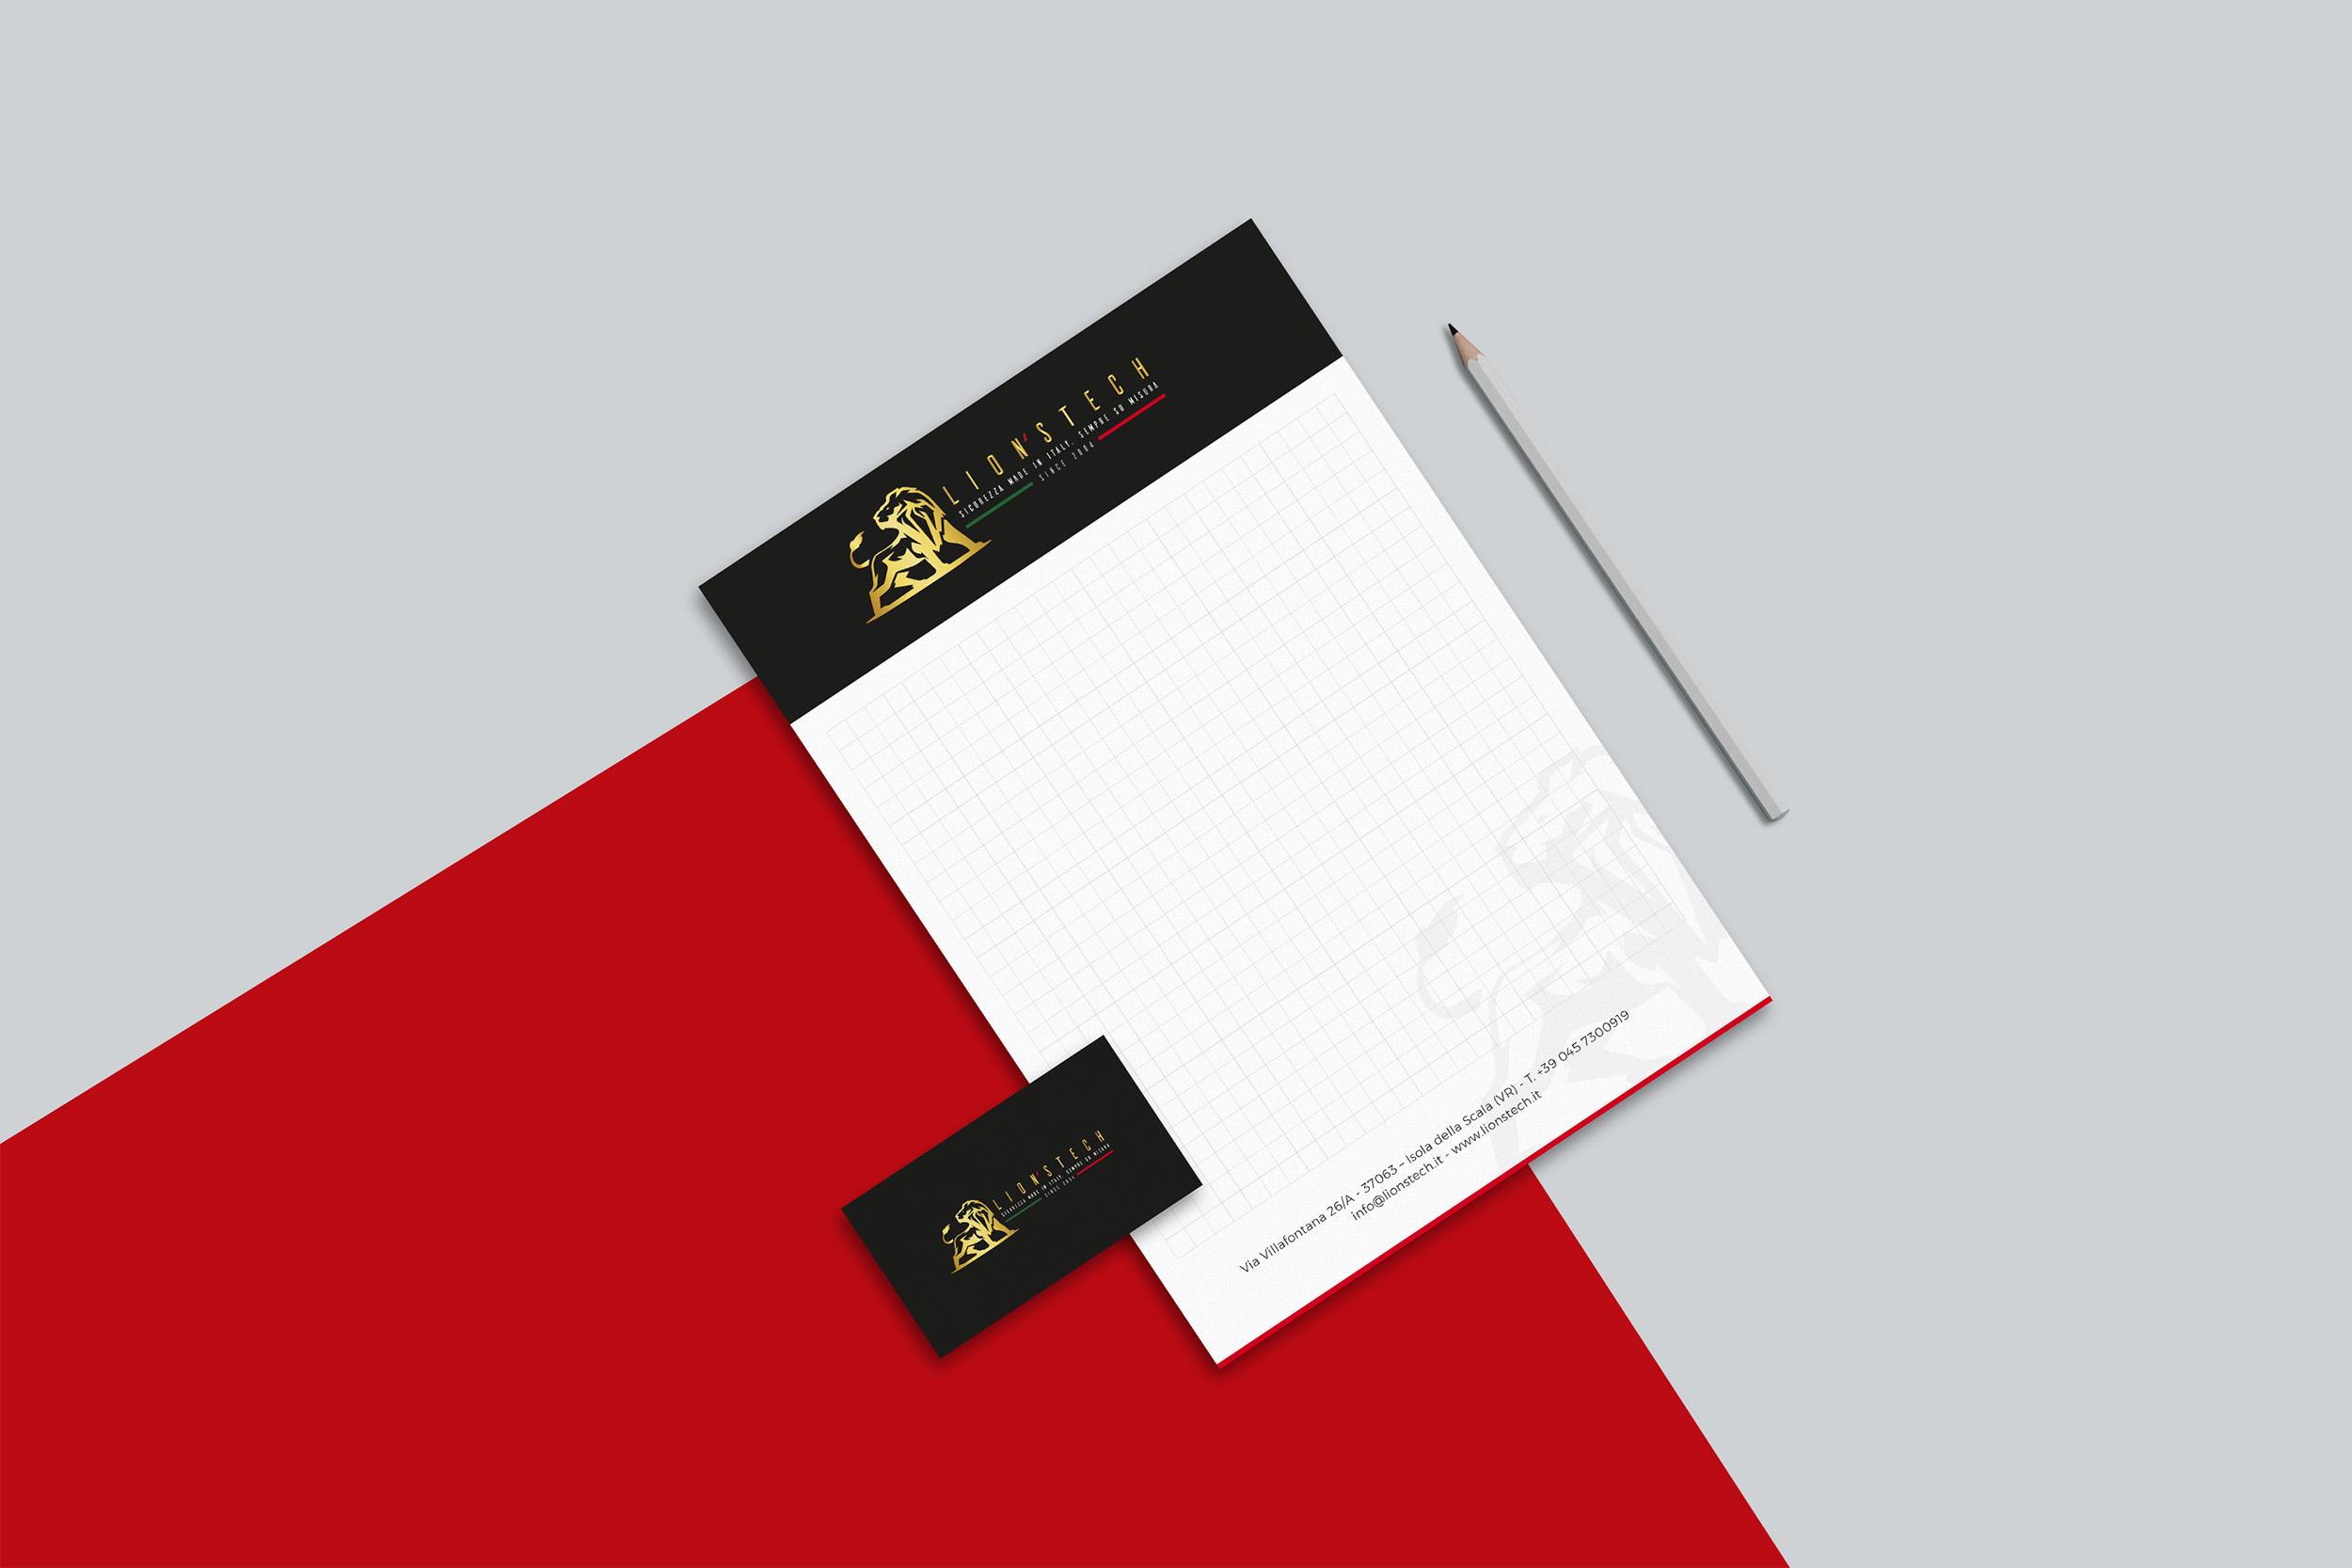 Studio grafico brand identity